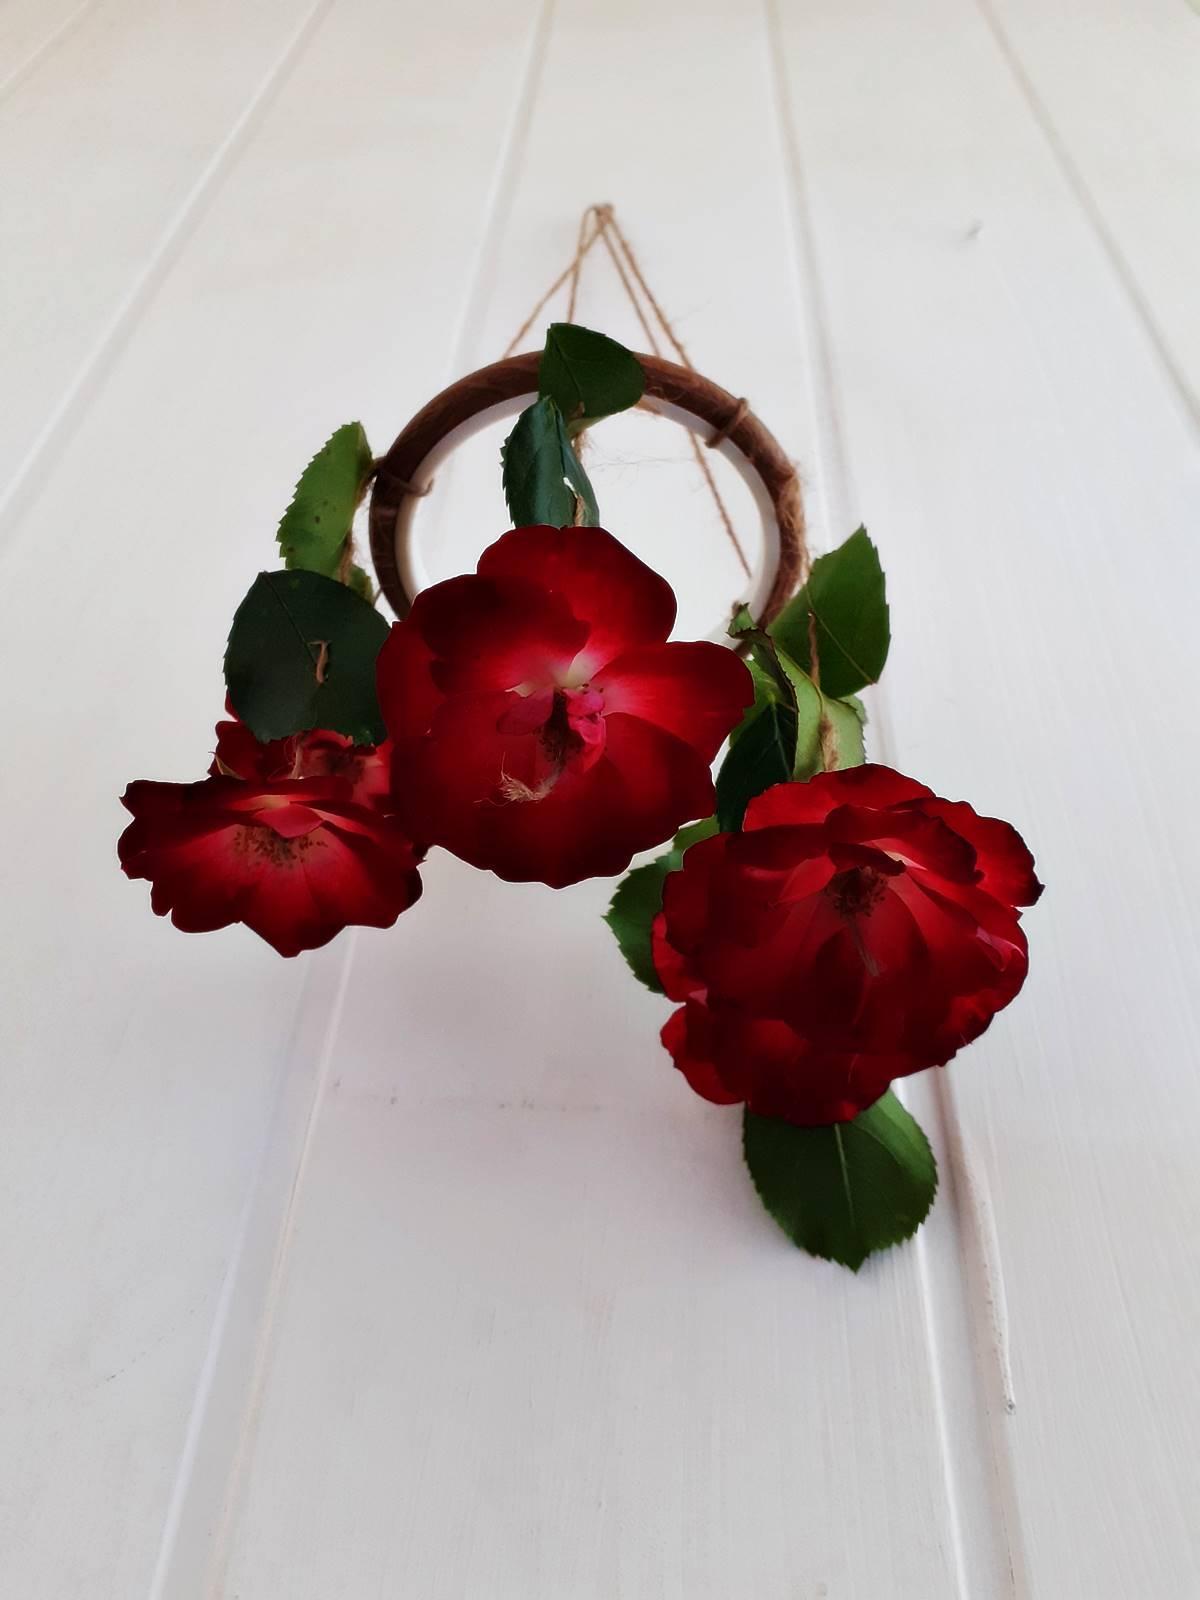 Roses diy mobile cadre photo blog20200526 131453